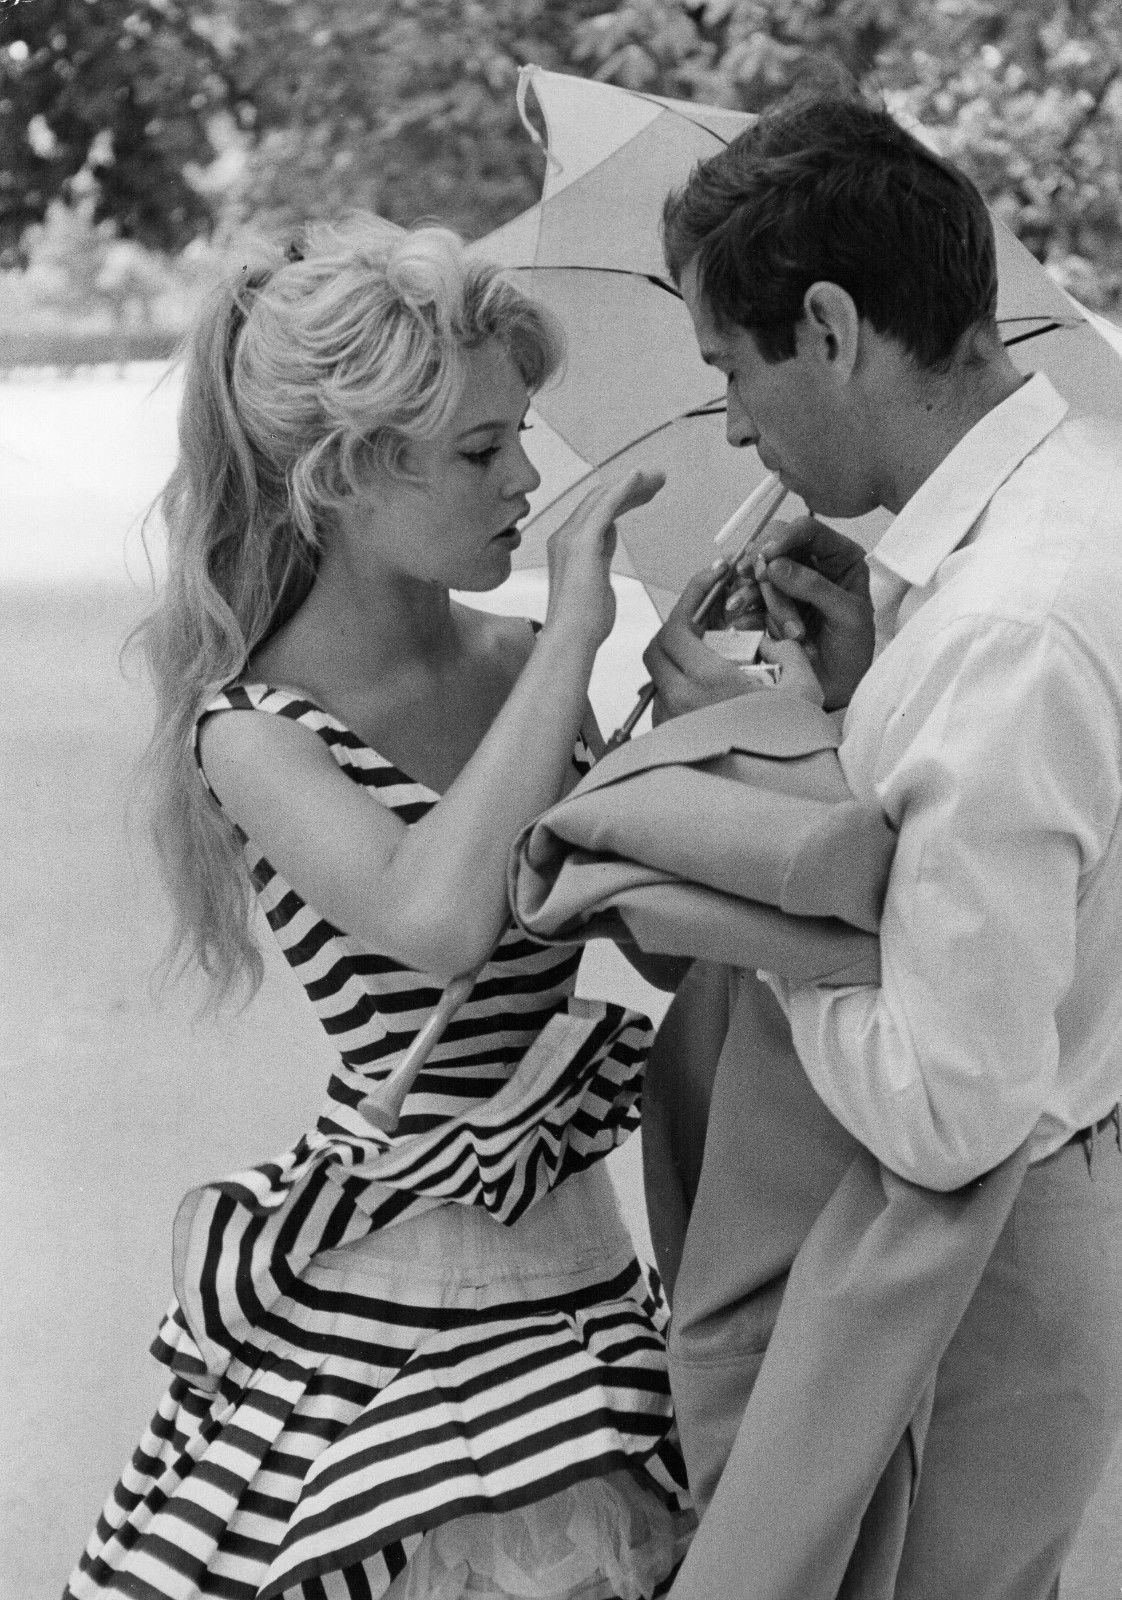 Glorious Queensbrigitte Bardot And Roger Vadim 1950s 1960s